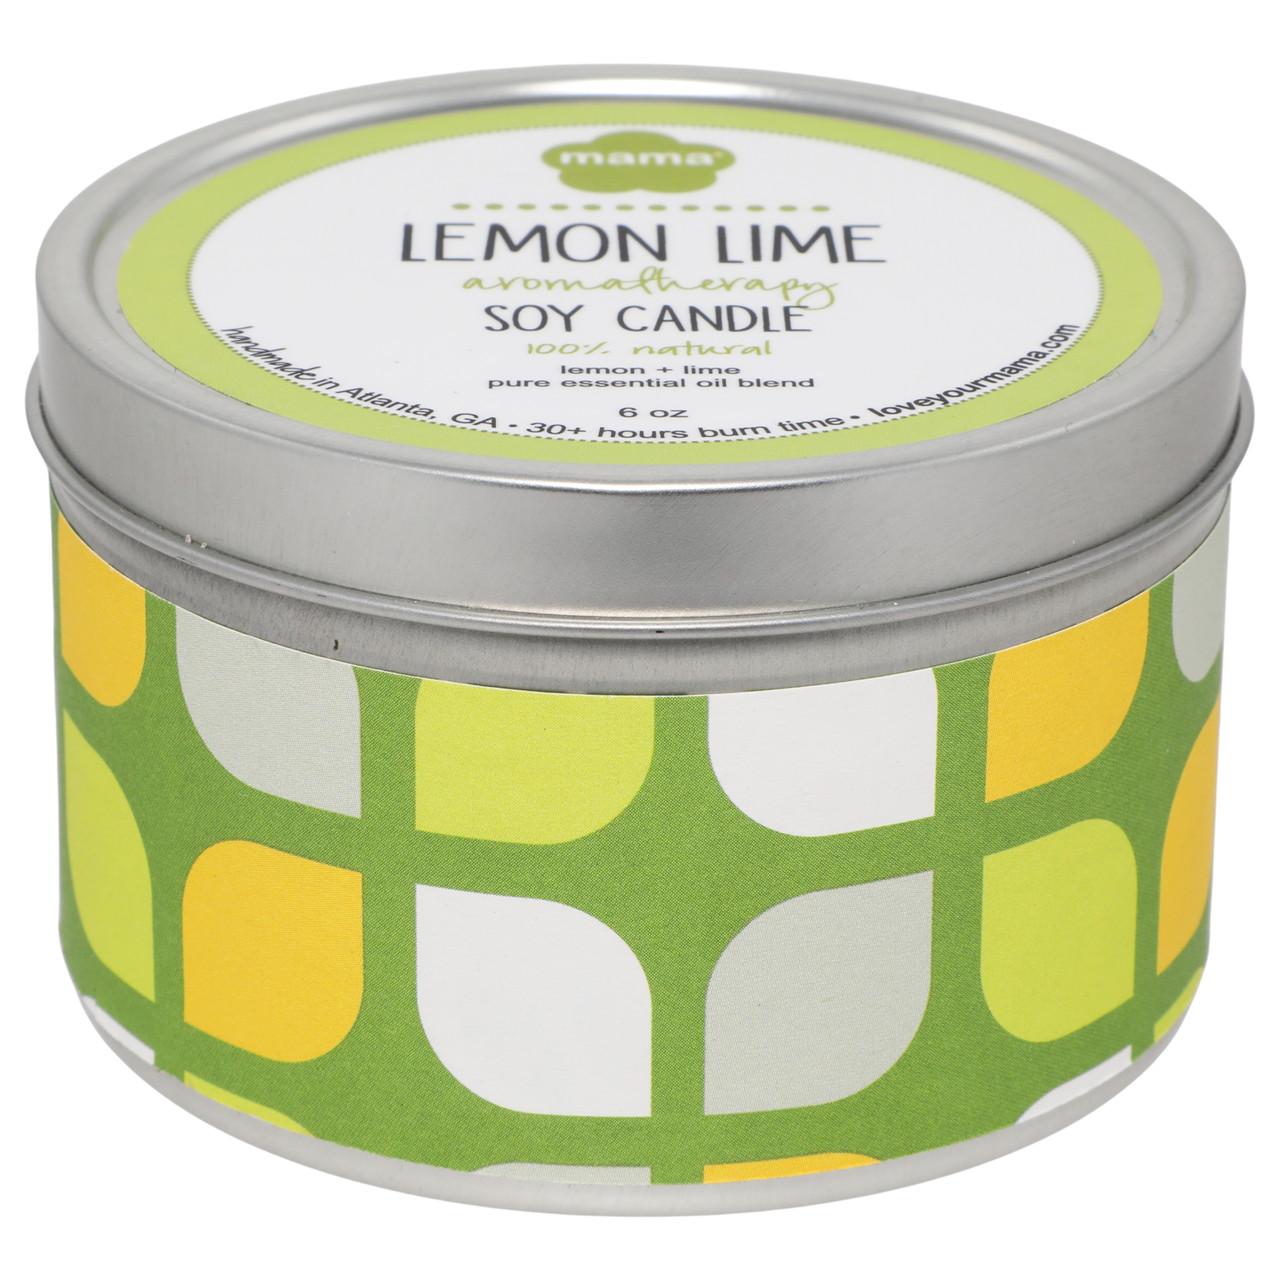 Lemon + Lime 6 oz. Soy Candle Tin | Mama Bath + Body